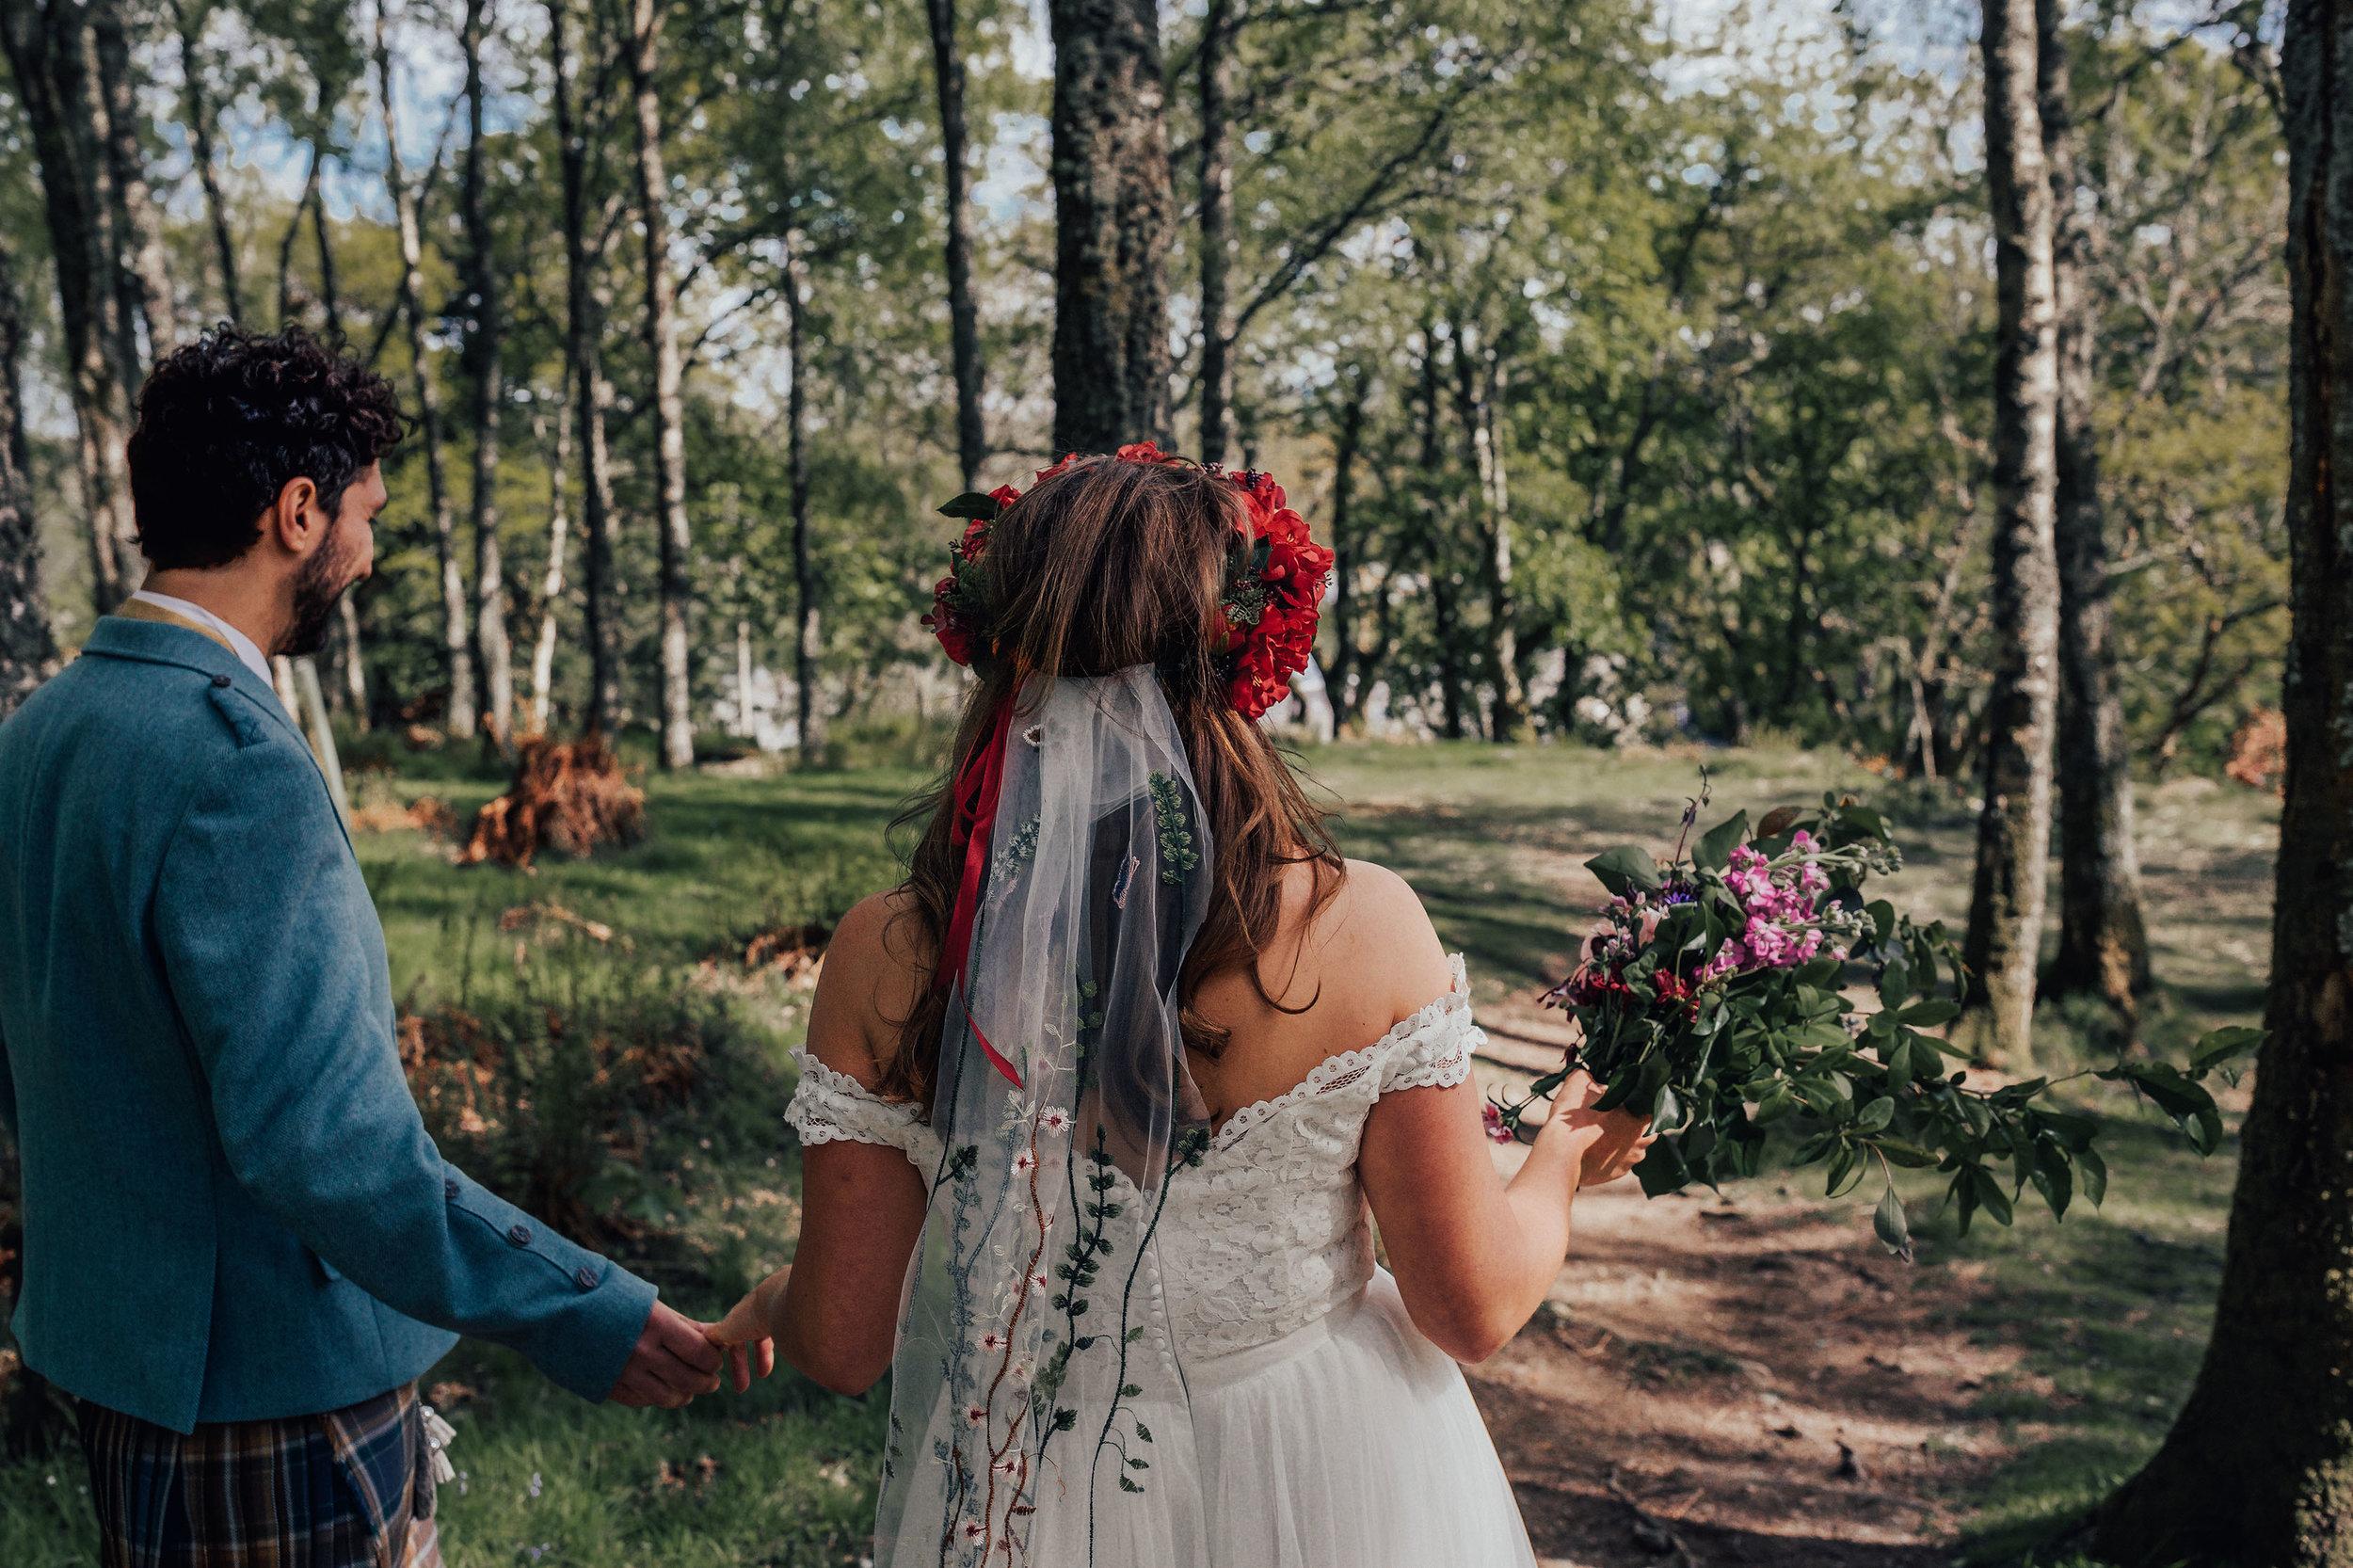 COMRIE_CROFT_WEDDINGS_PJ_PHILLIPS_PHOTOGRAPHY_107.jpg